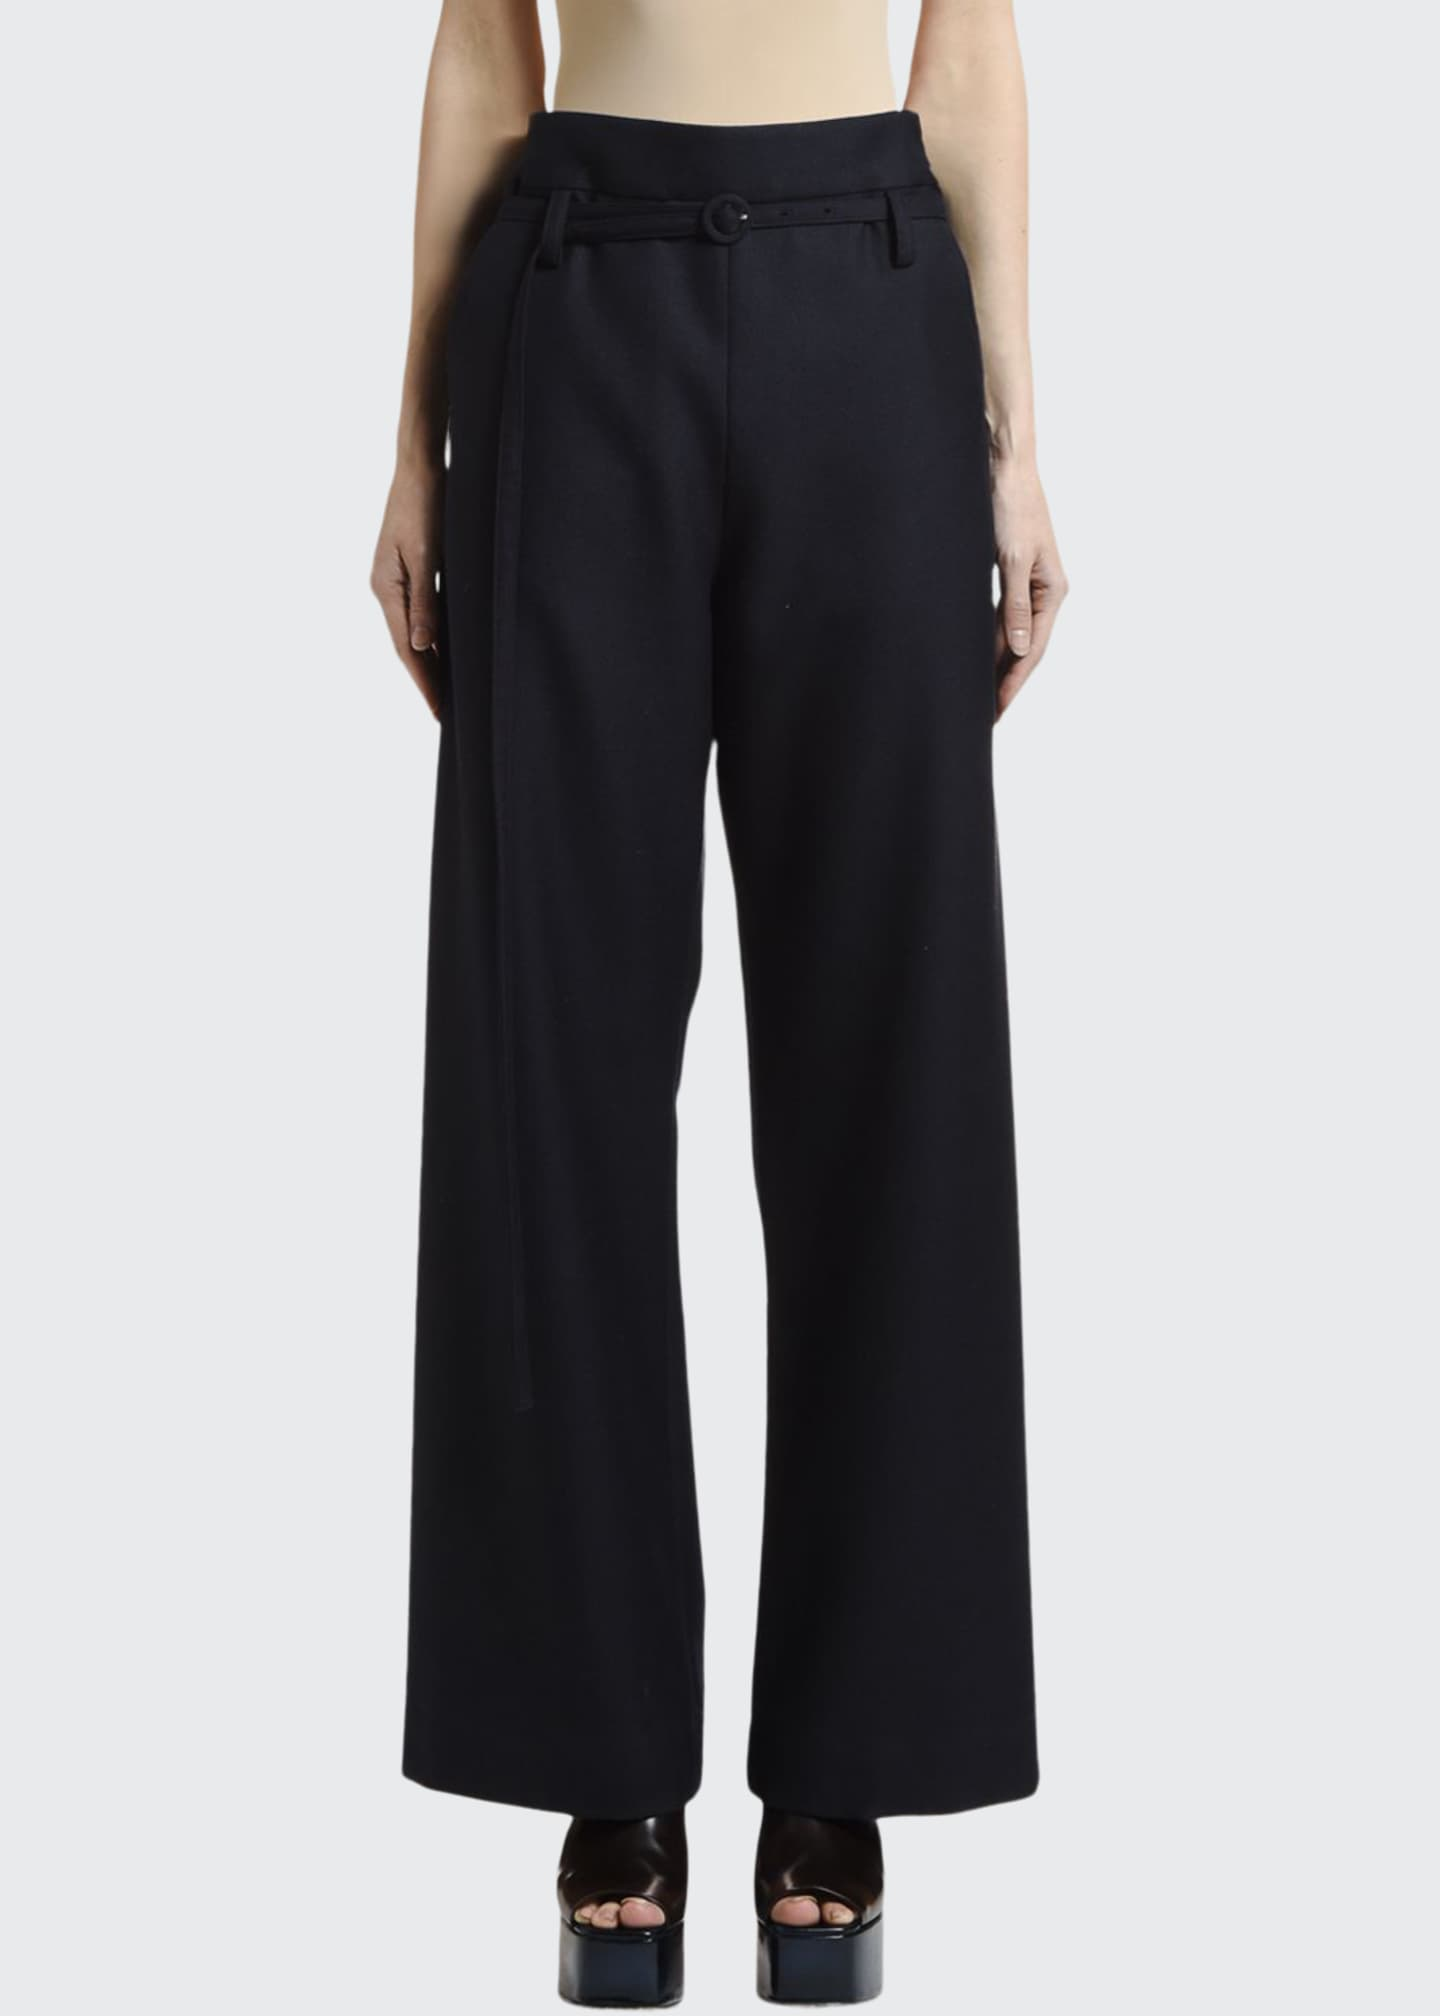 Marni Light Flannel Paperbag Pants